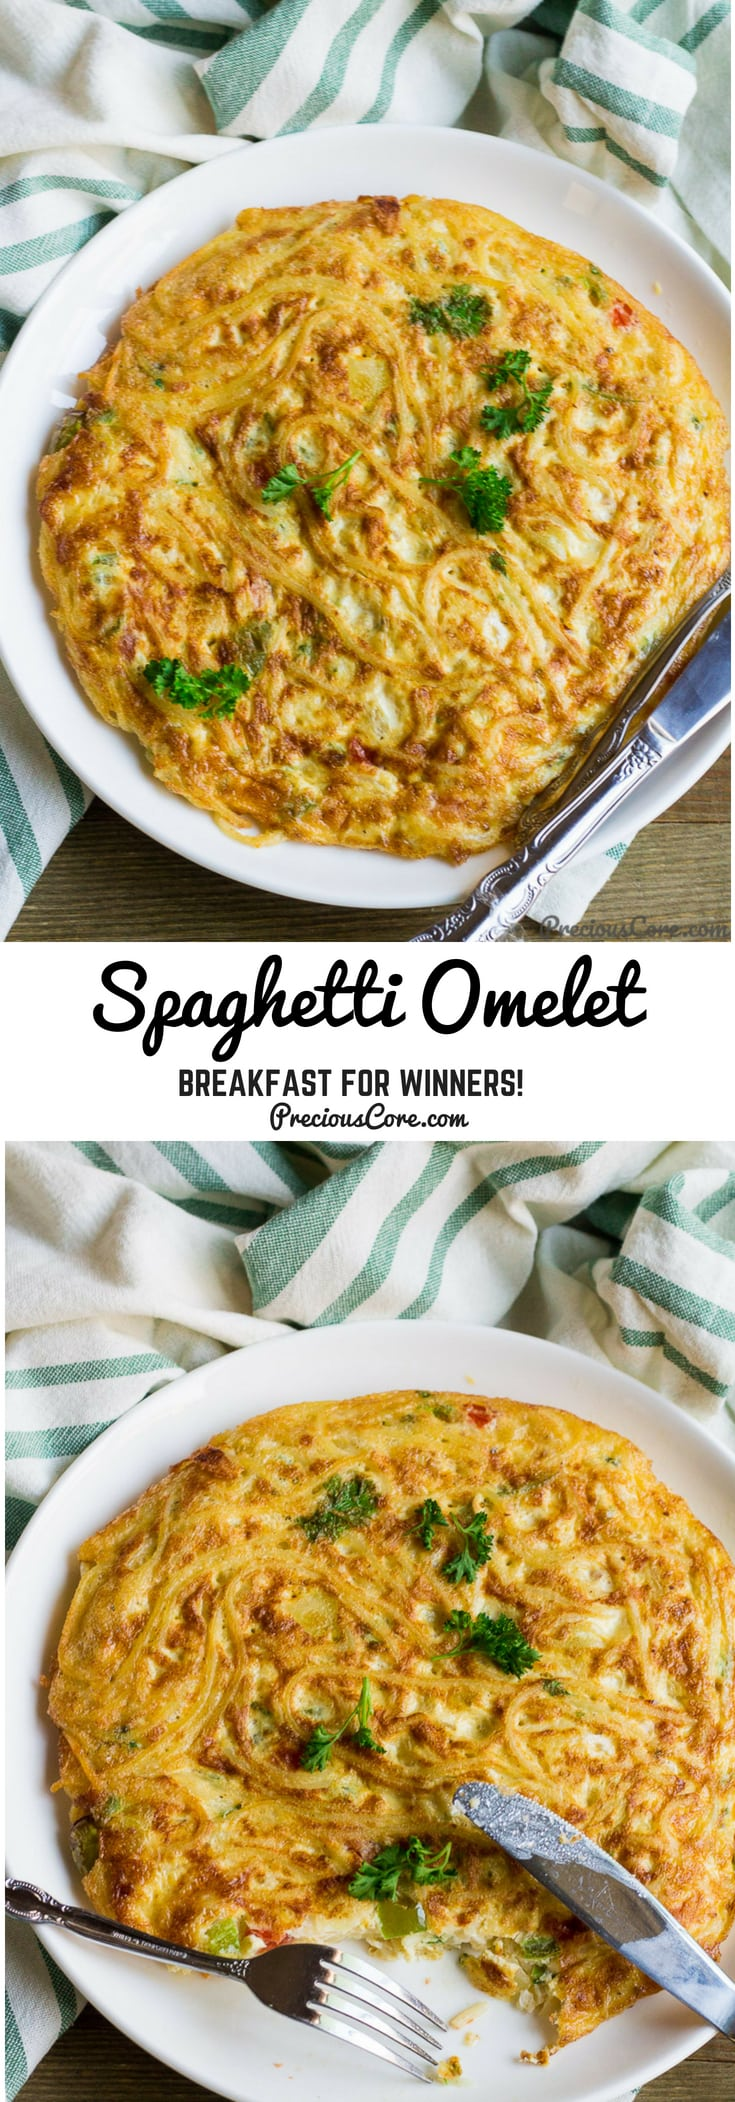 This spaghetti omelette recipe can be best described as breakfast for winners! #Breakfast #Spaghetti #PreciousCore